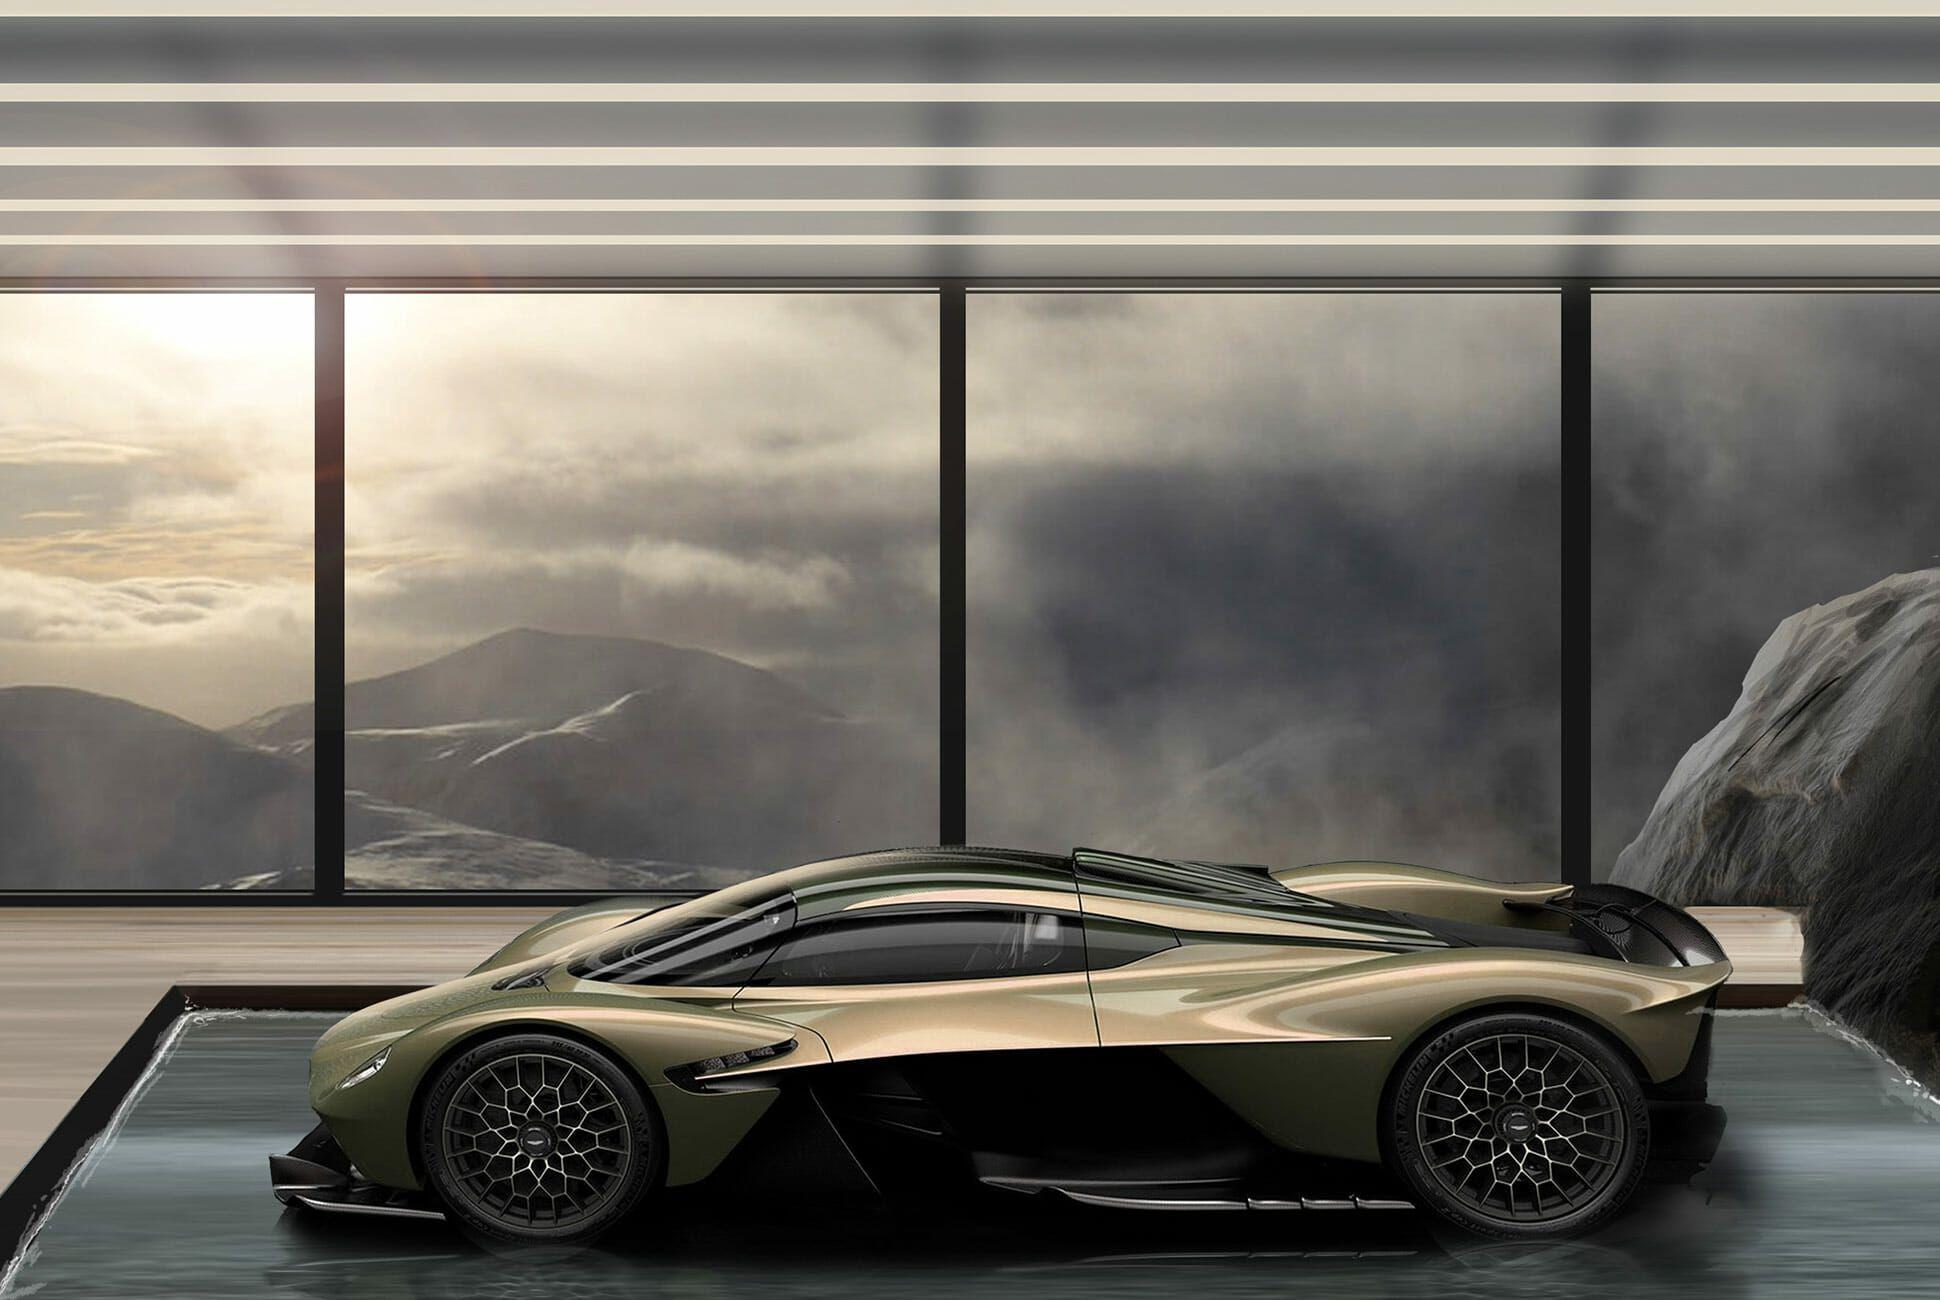 Aston-Martin-Bond-Villain-Lairs-gear-patrol-slide-3